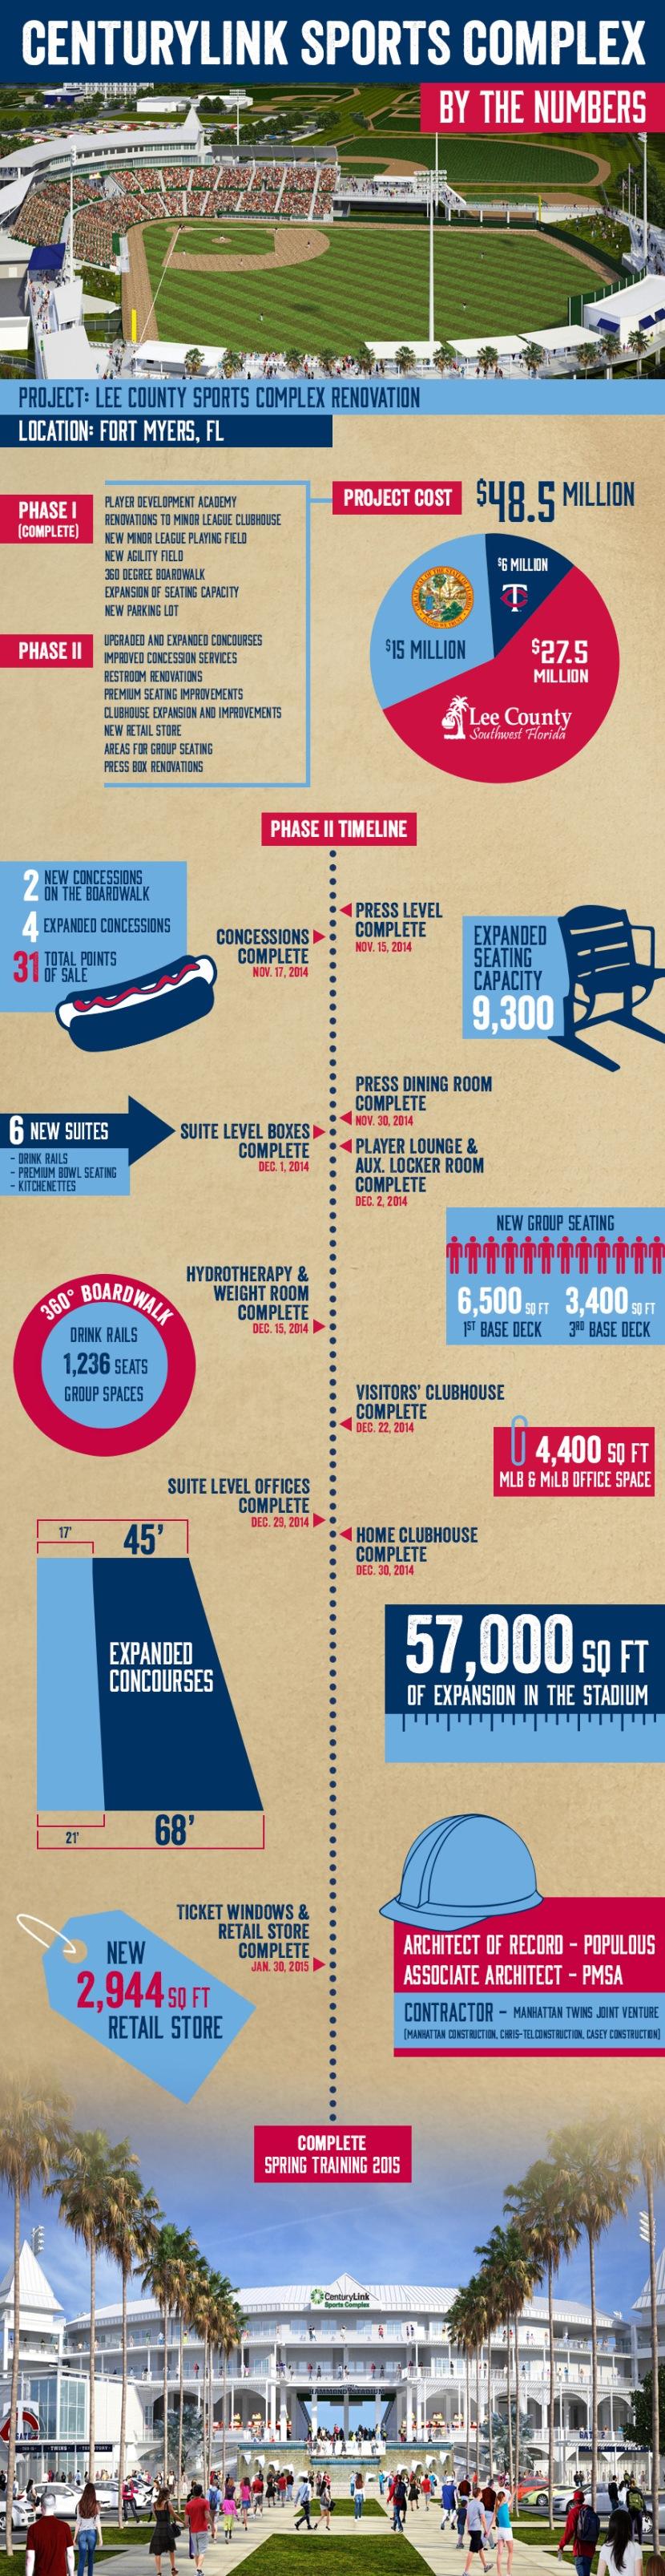 CLSC infographic